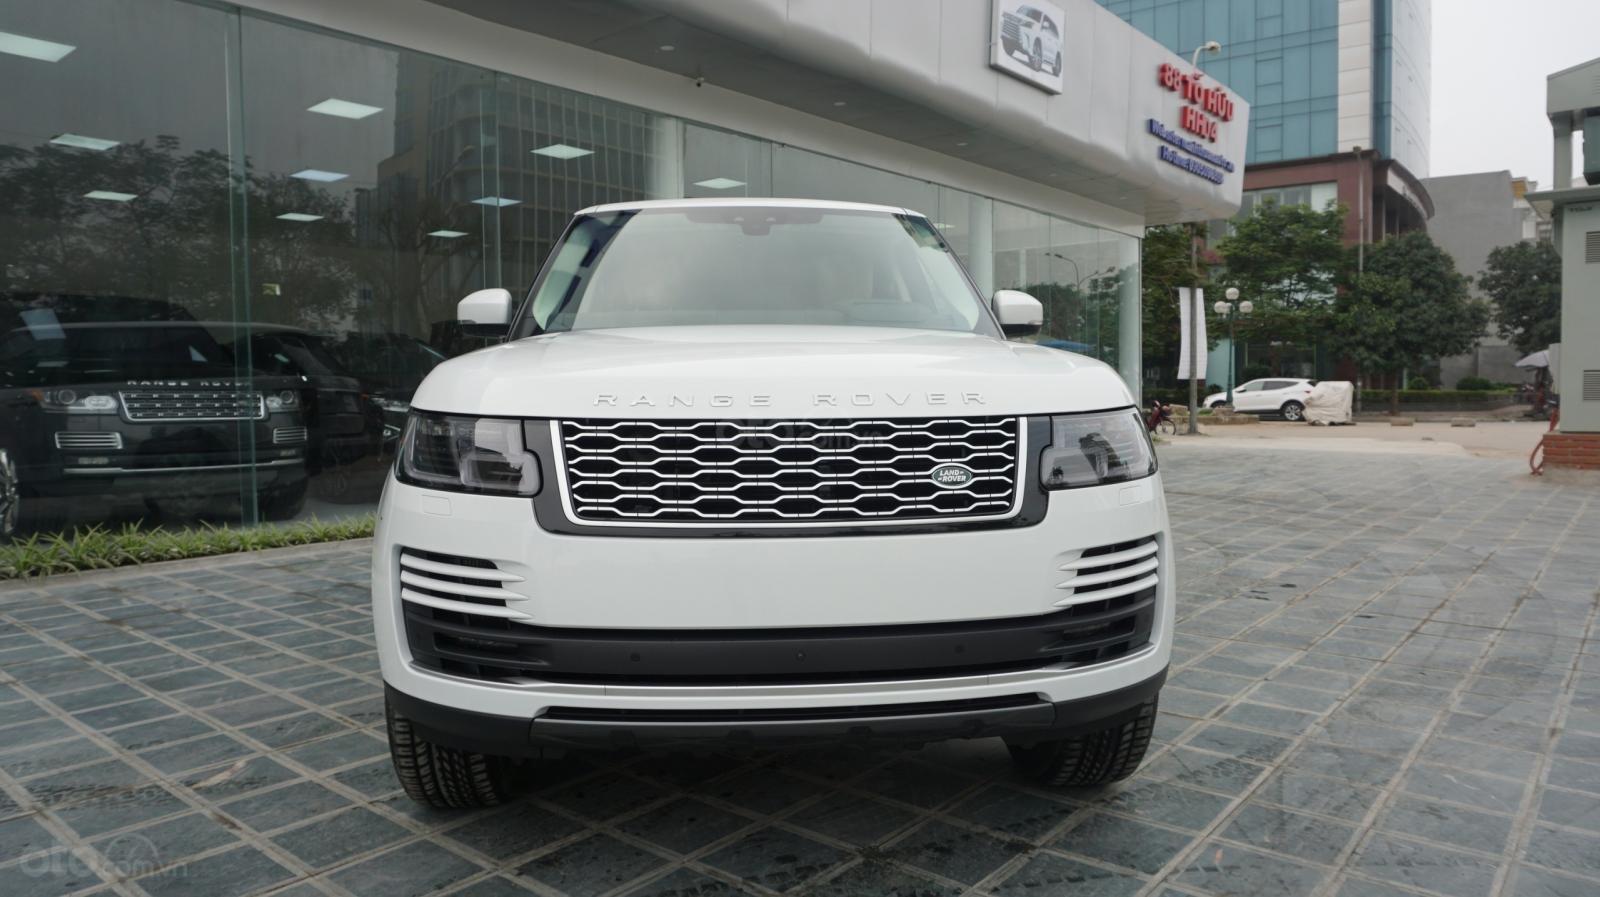 Cần bán xe LandRover Range Rover HSE năm 2019, màu trắng, xe nhập-0